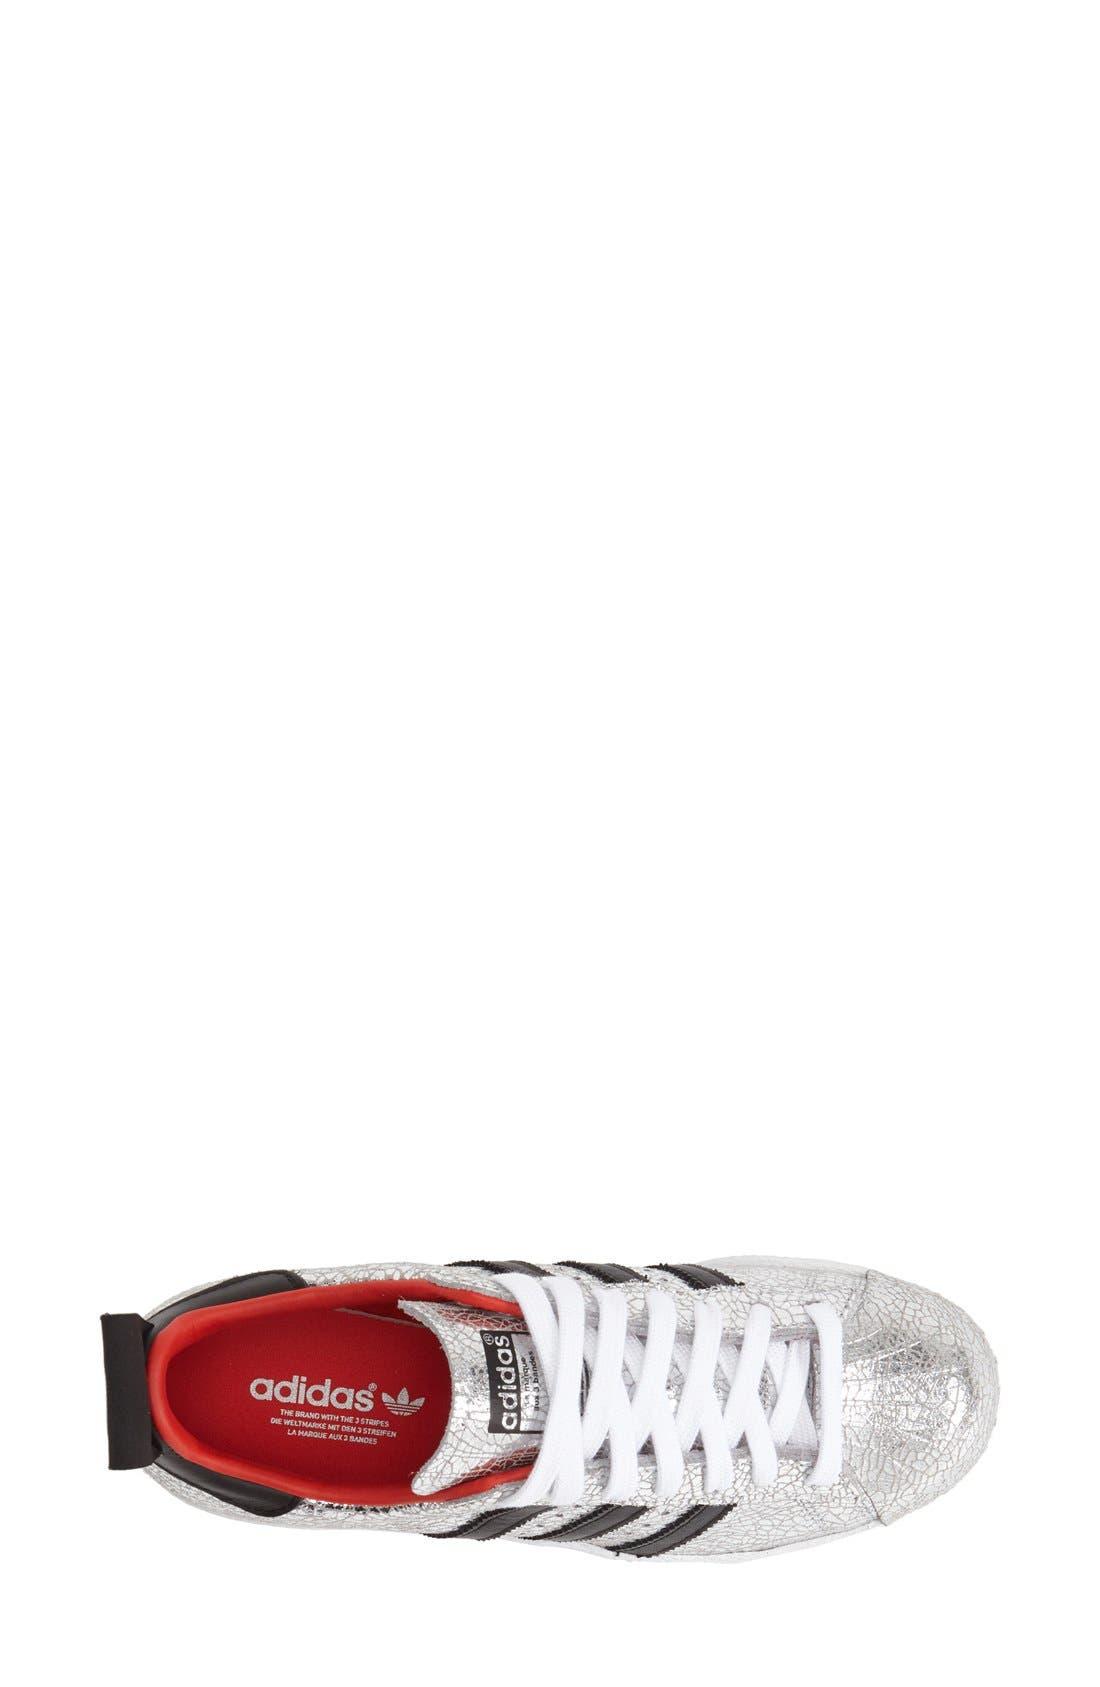 Alternate Image 3  - Topshop for adidas Originals '80s Premium Superstar' Sneaker (Women)